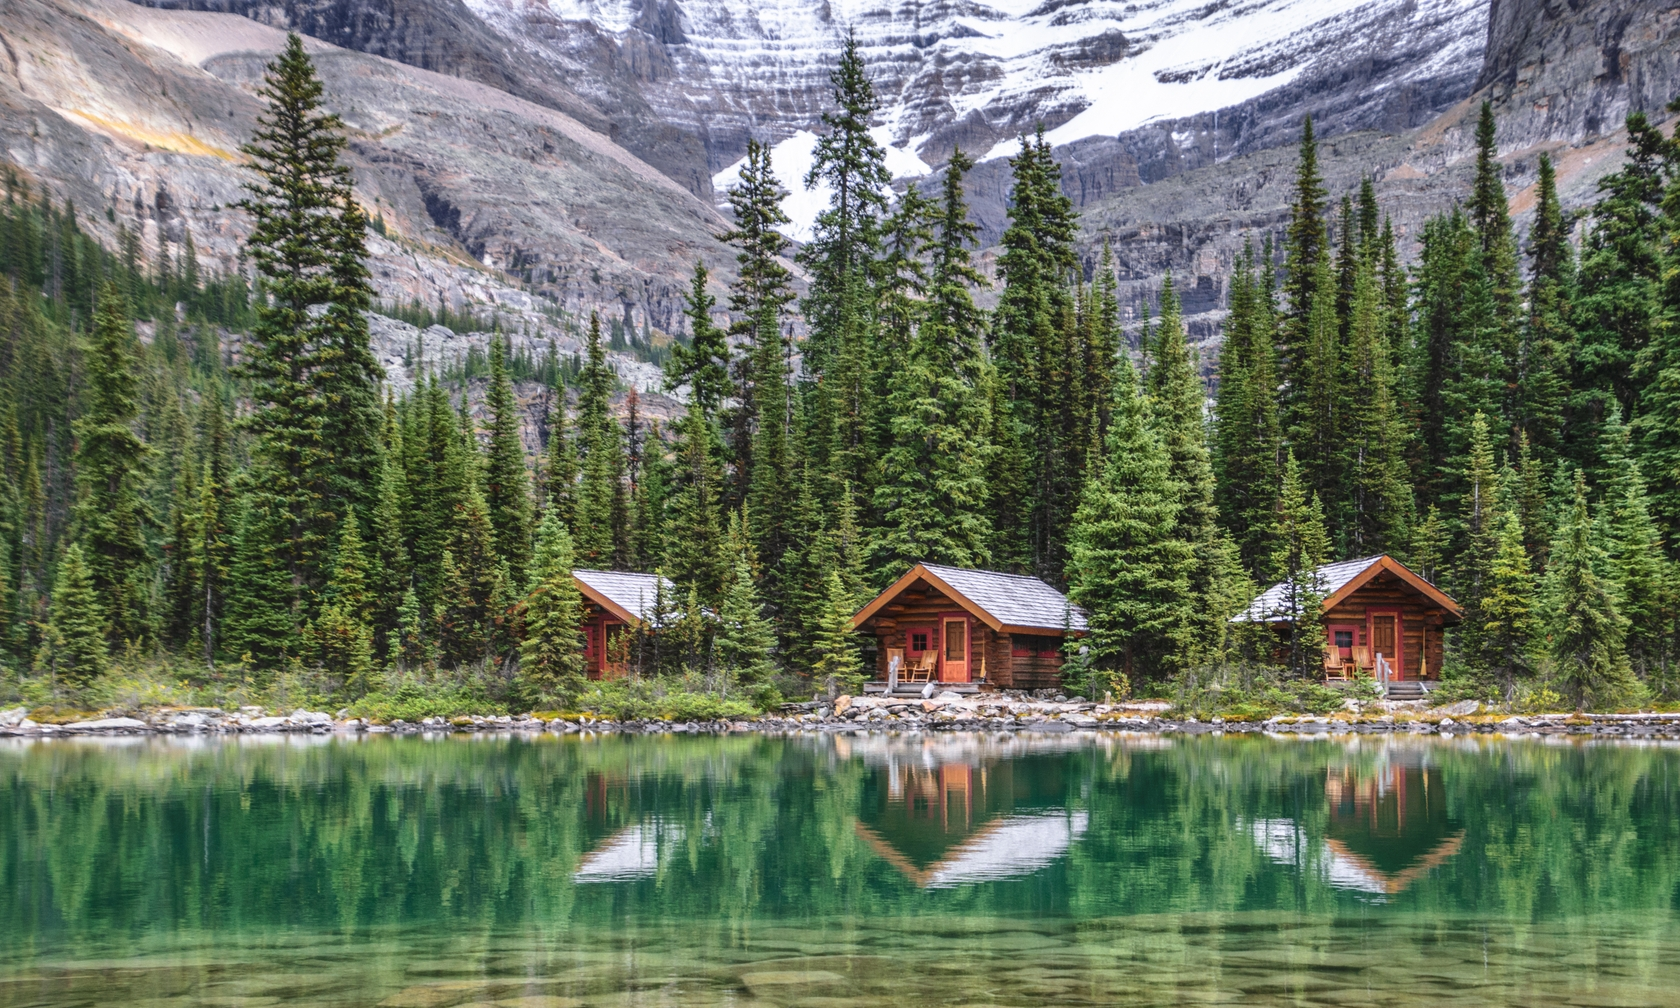 Vacation rentals in British Columbia